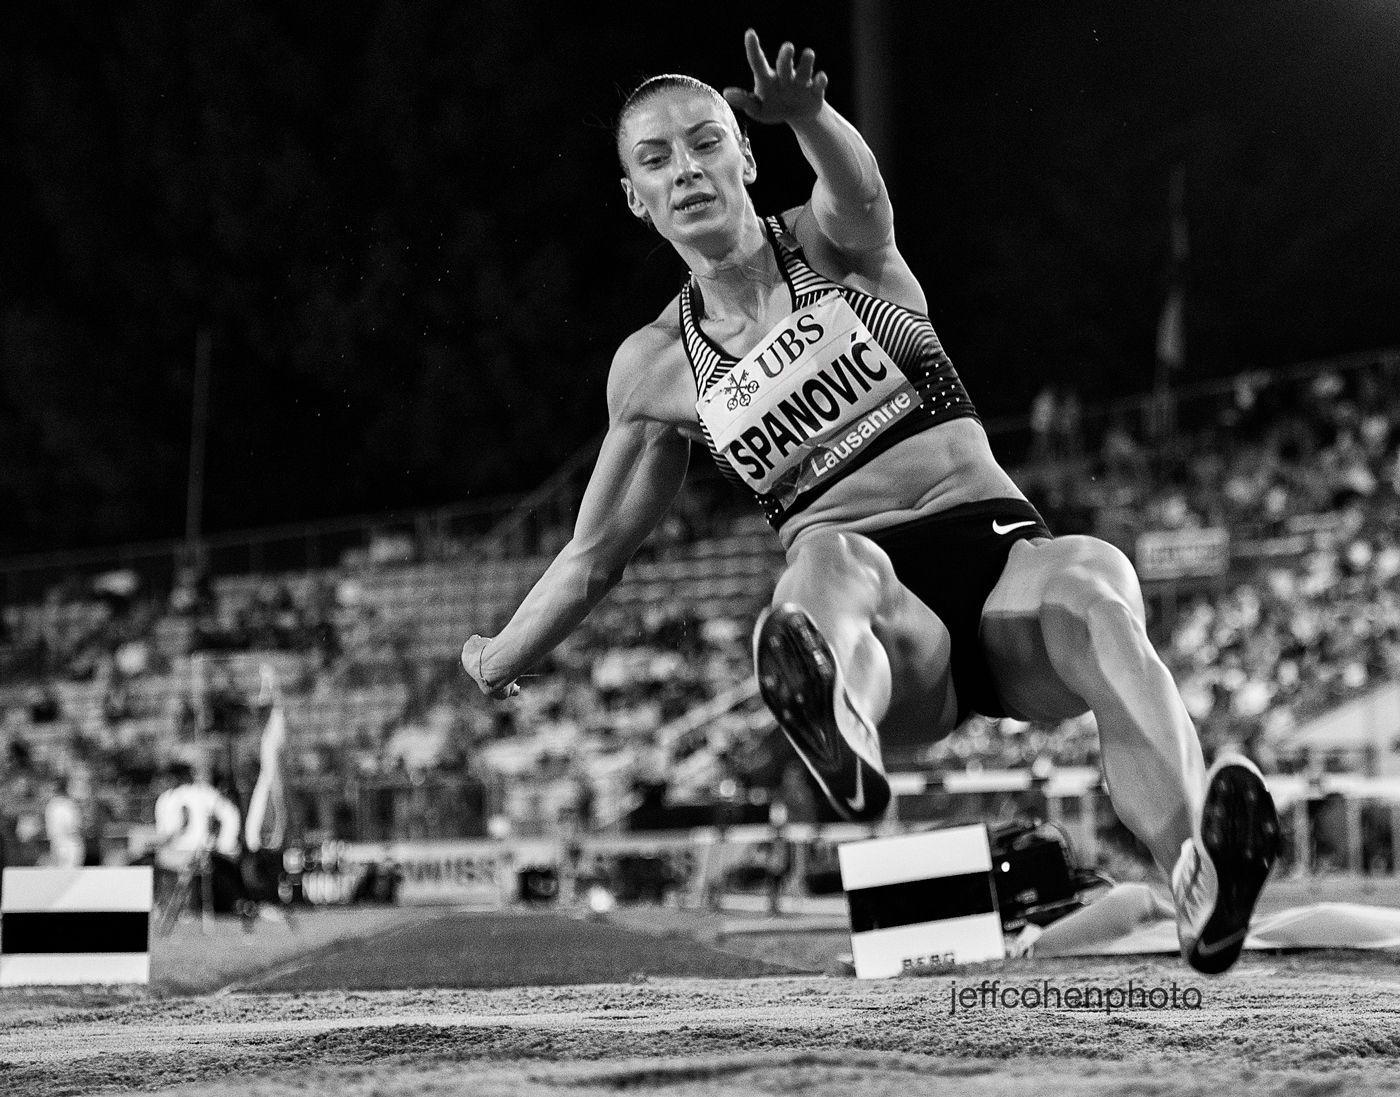 1r2016_athletissima_lausanne_spanovic_bw_ljw_jeff_cohen_photo_1966_web.jpg